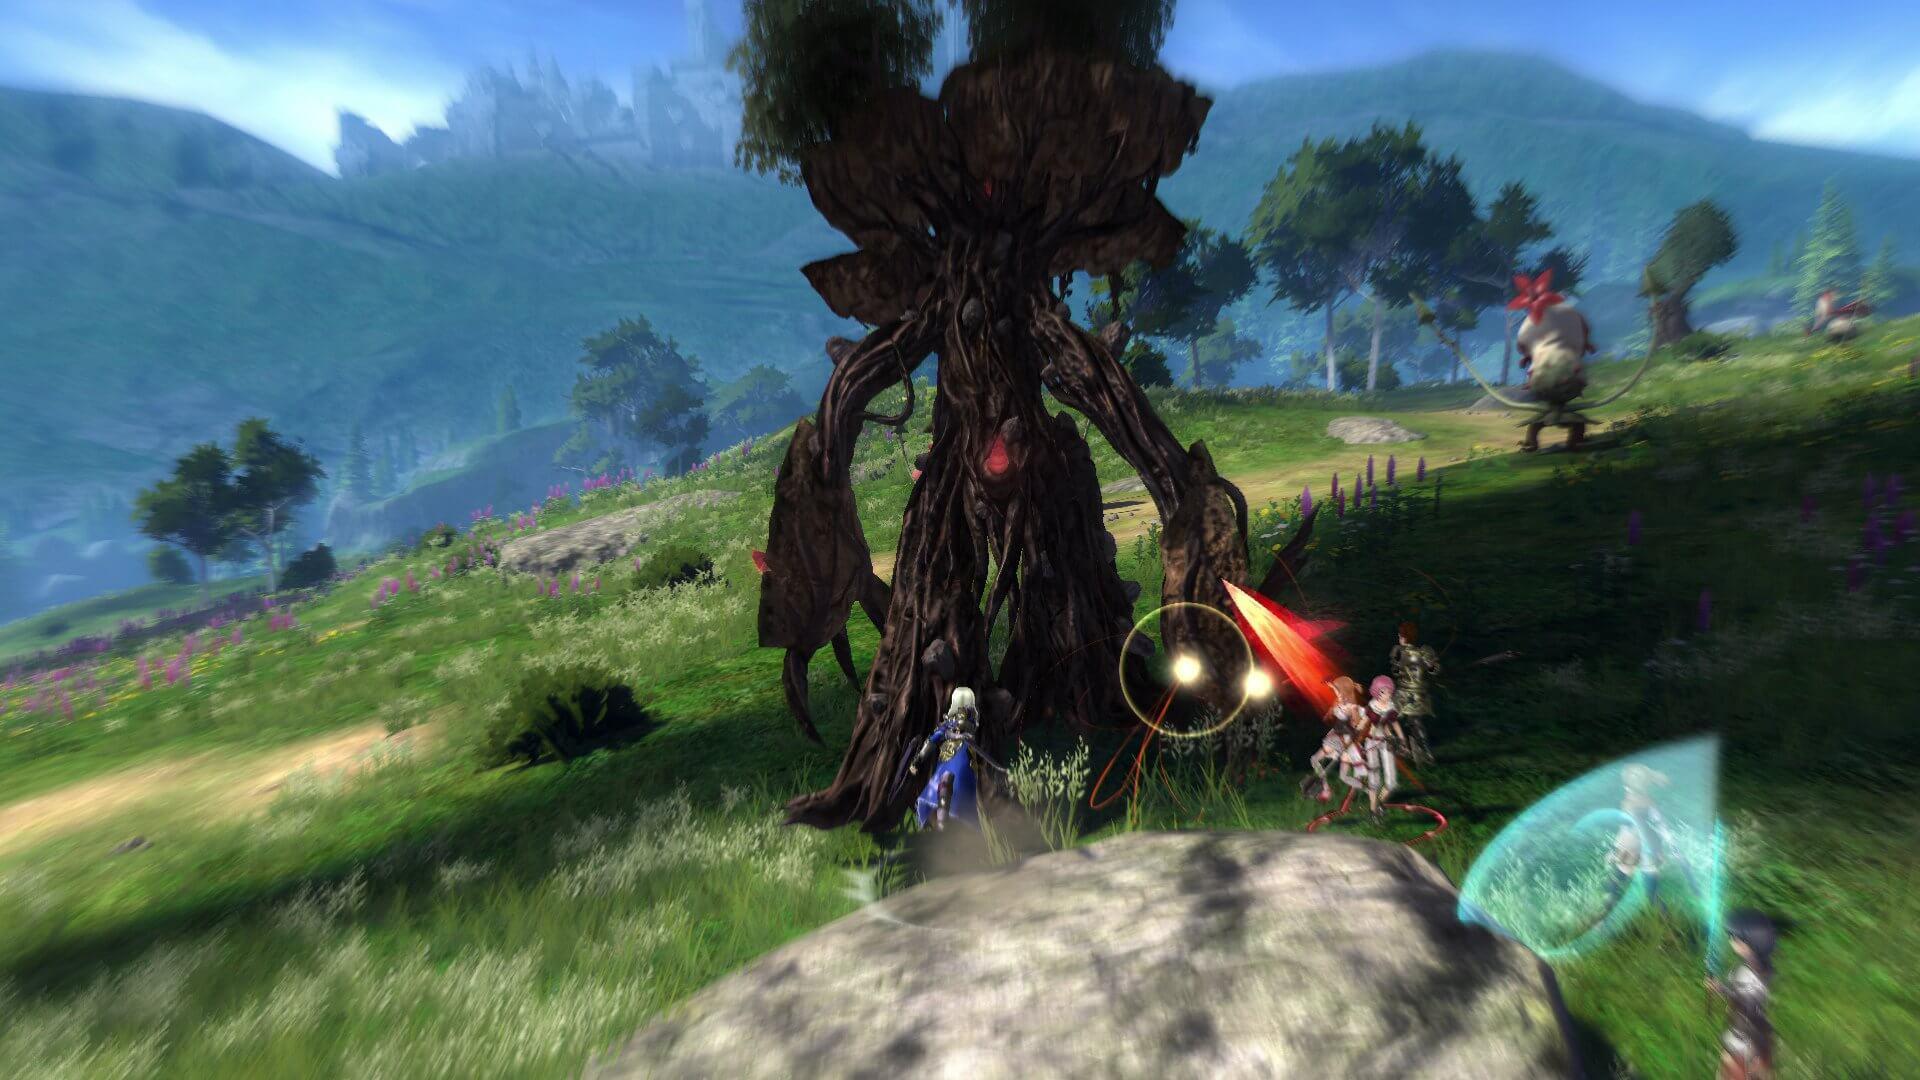 descargar Sword Art Online Hollow Realization para PC gratis 4